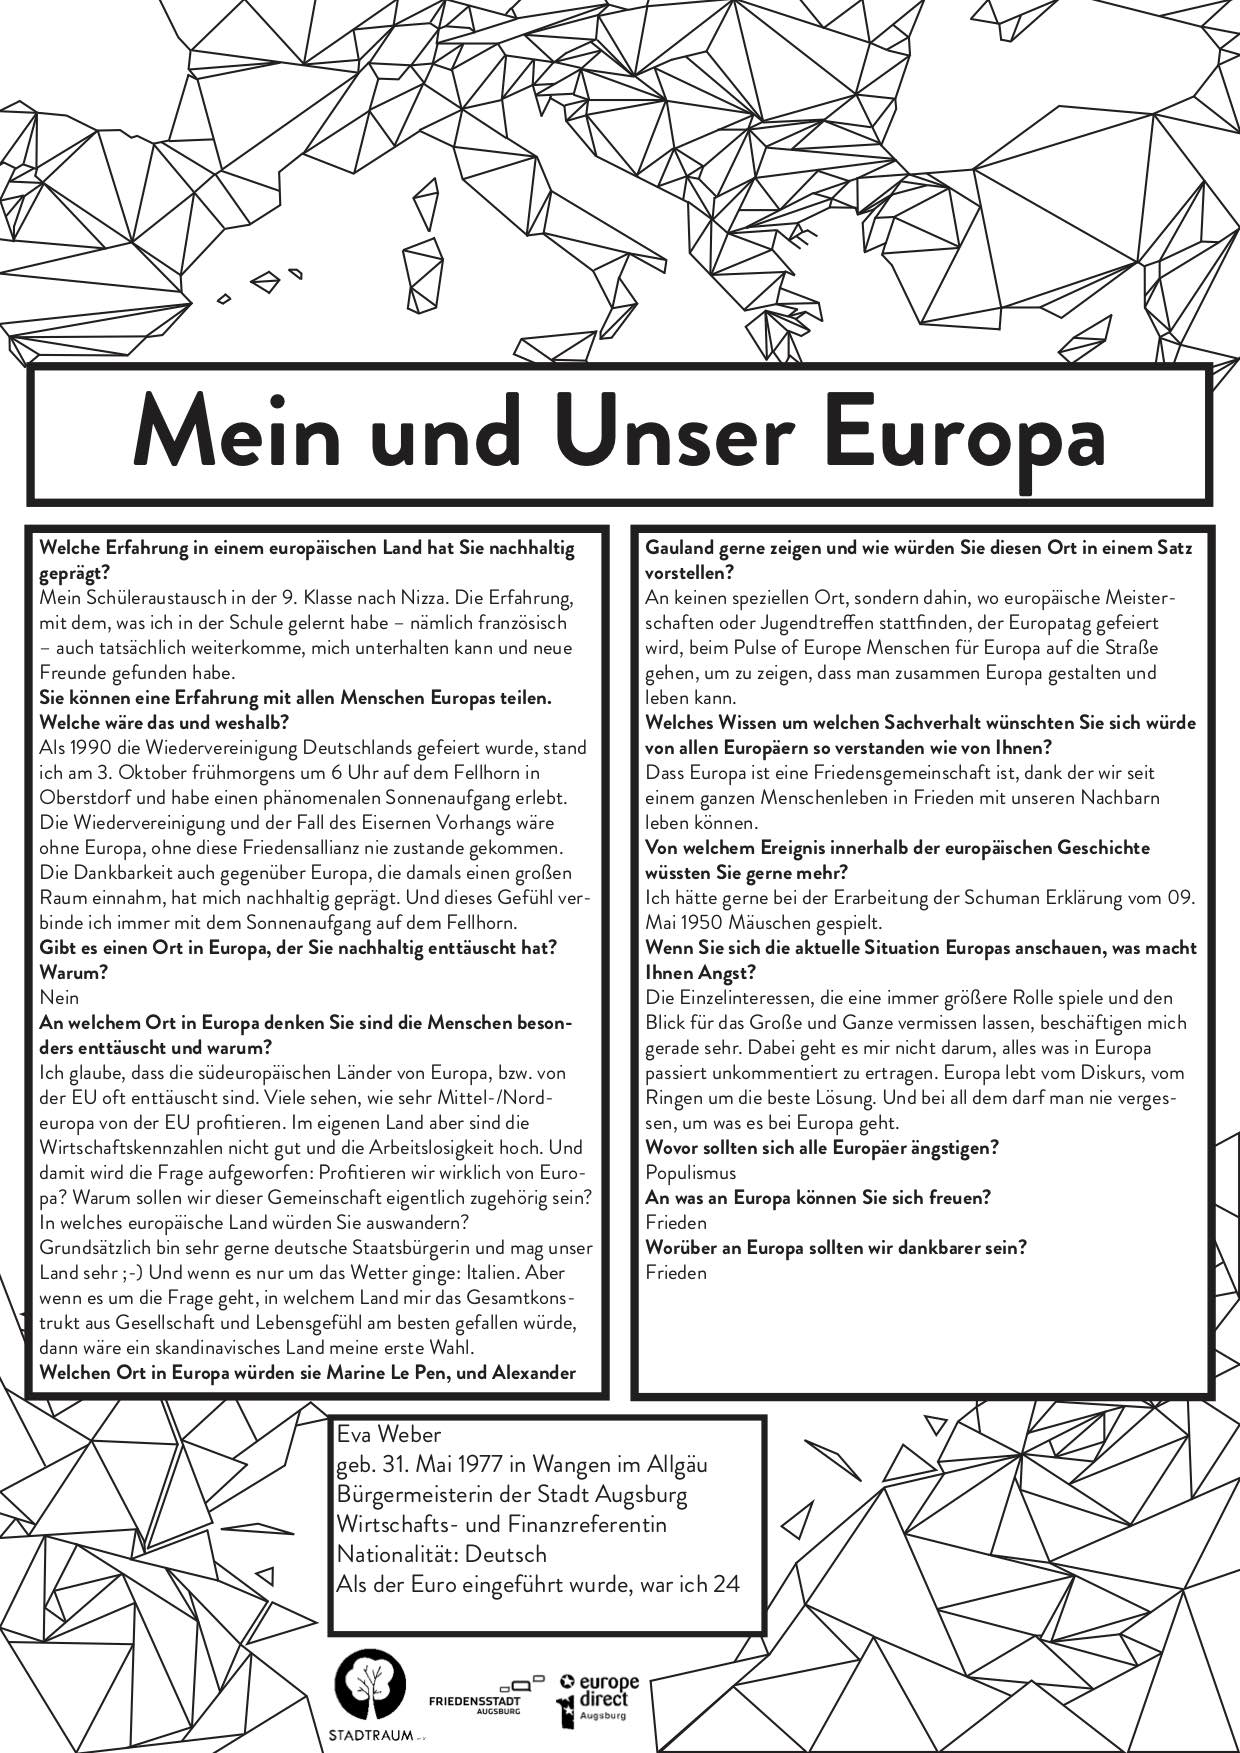 Europa weber